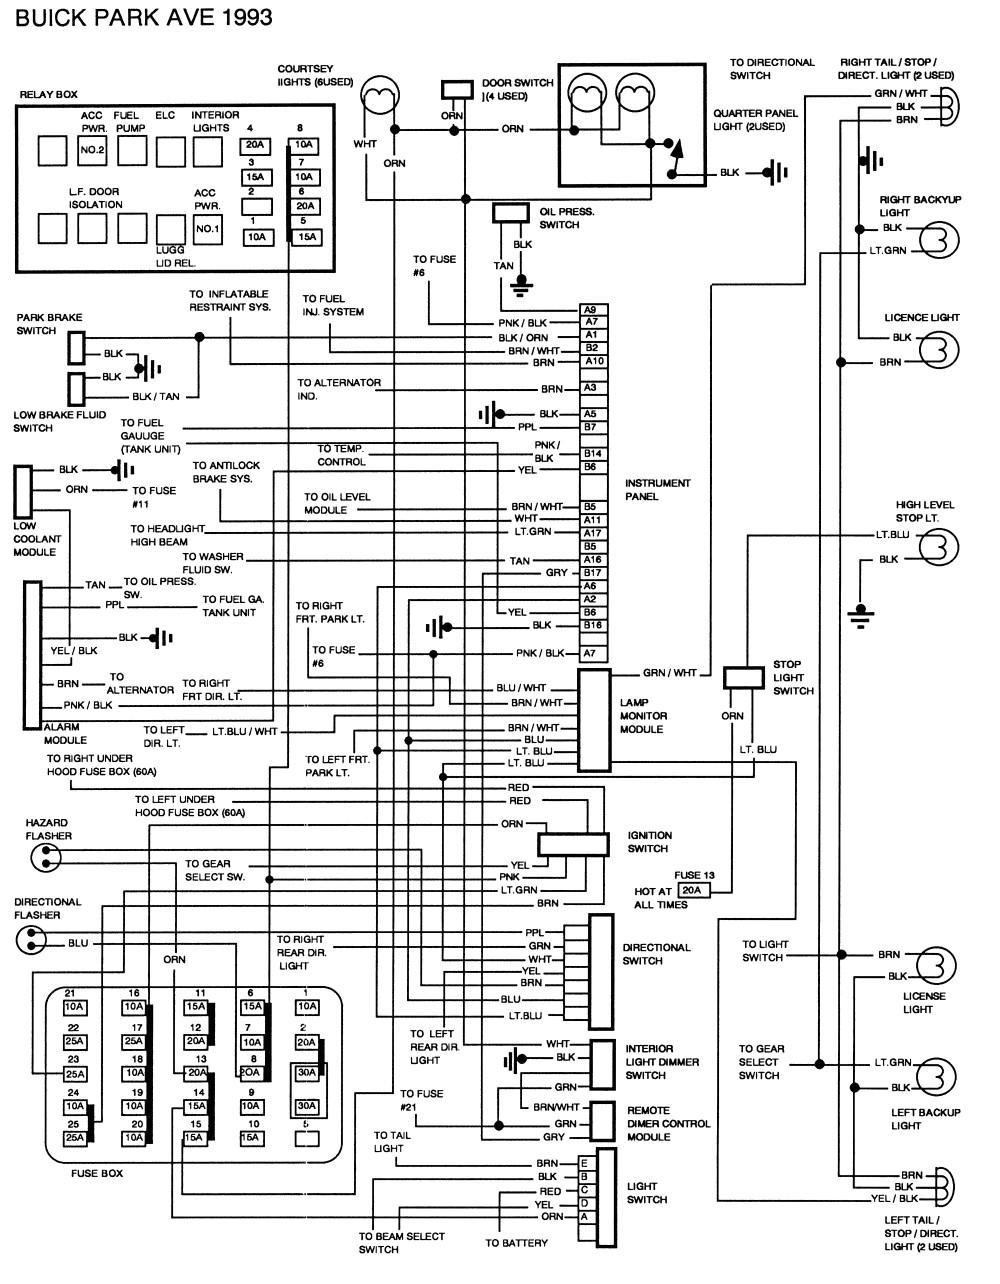 wrg 4500 2001 buick park avenue fuse box diagram moreover 2001 buick lesabre rear suspension diagram furthermore 1999